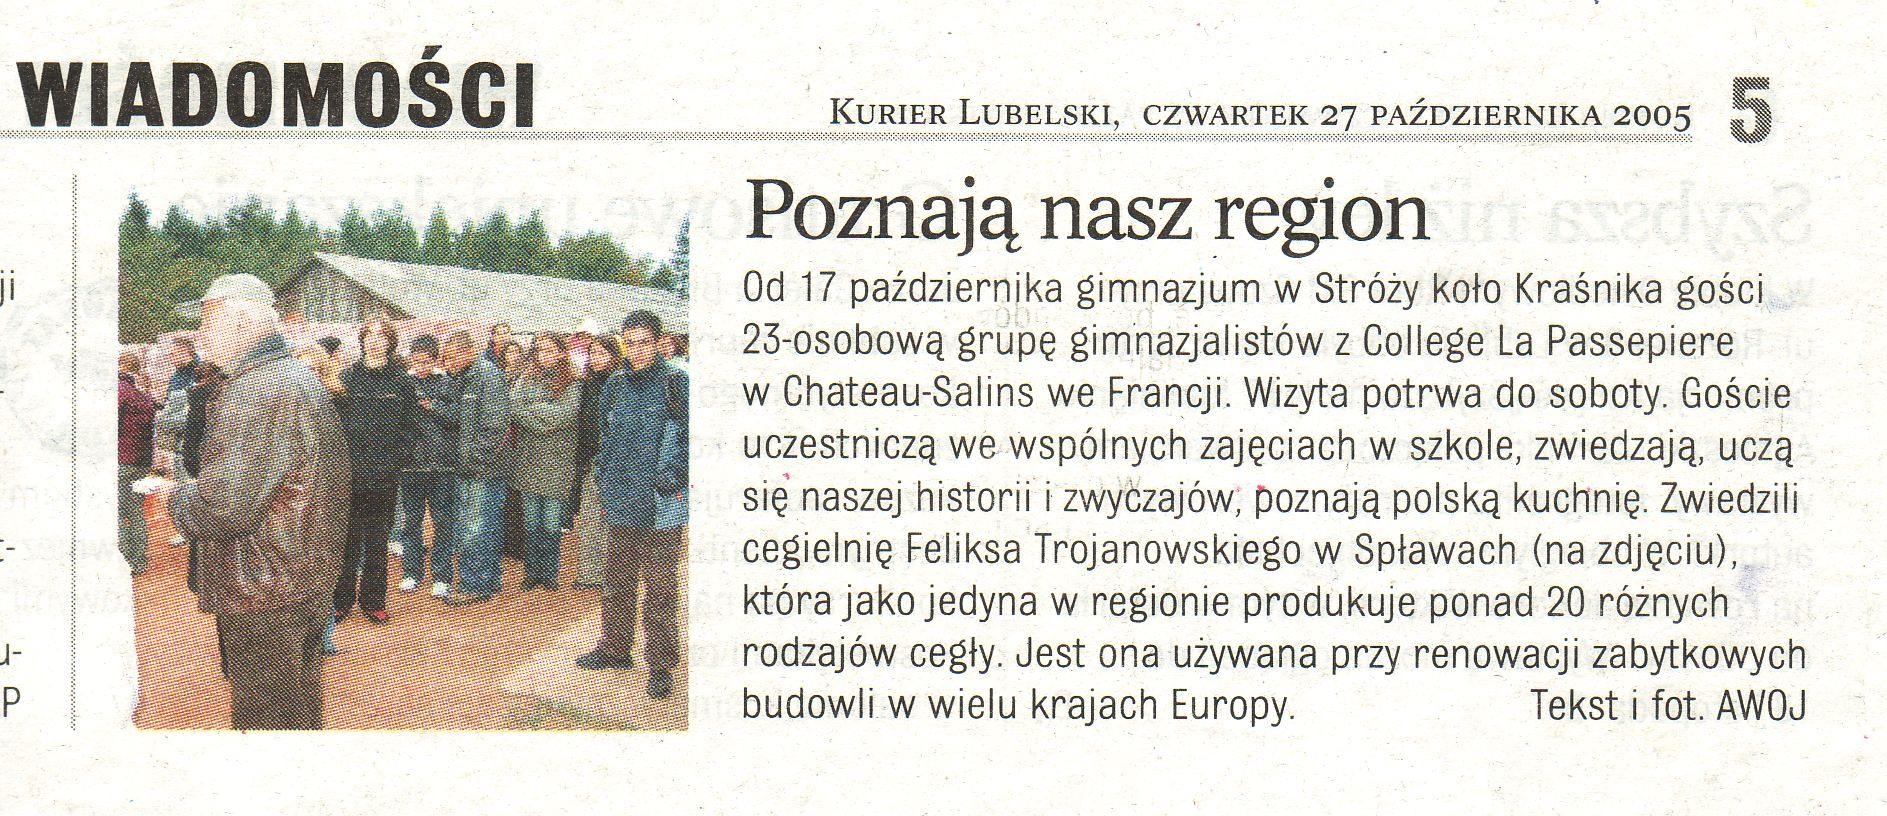 """Kurier Lubelski"" 27 Październik 2005"